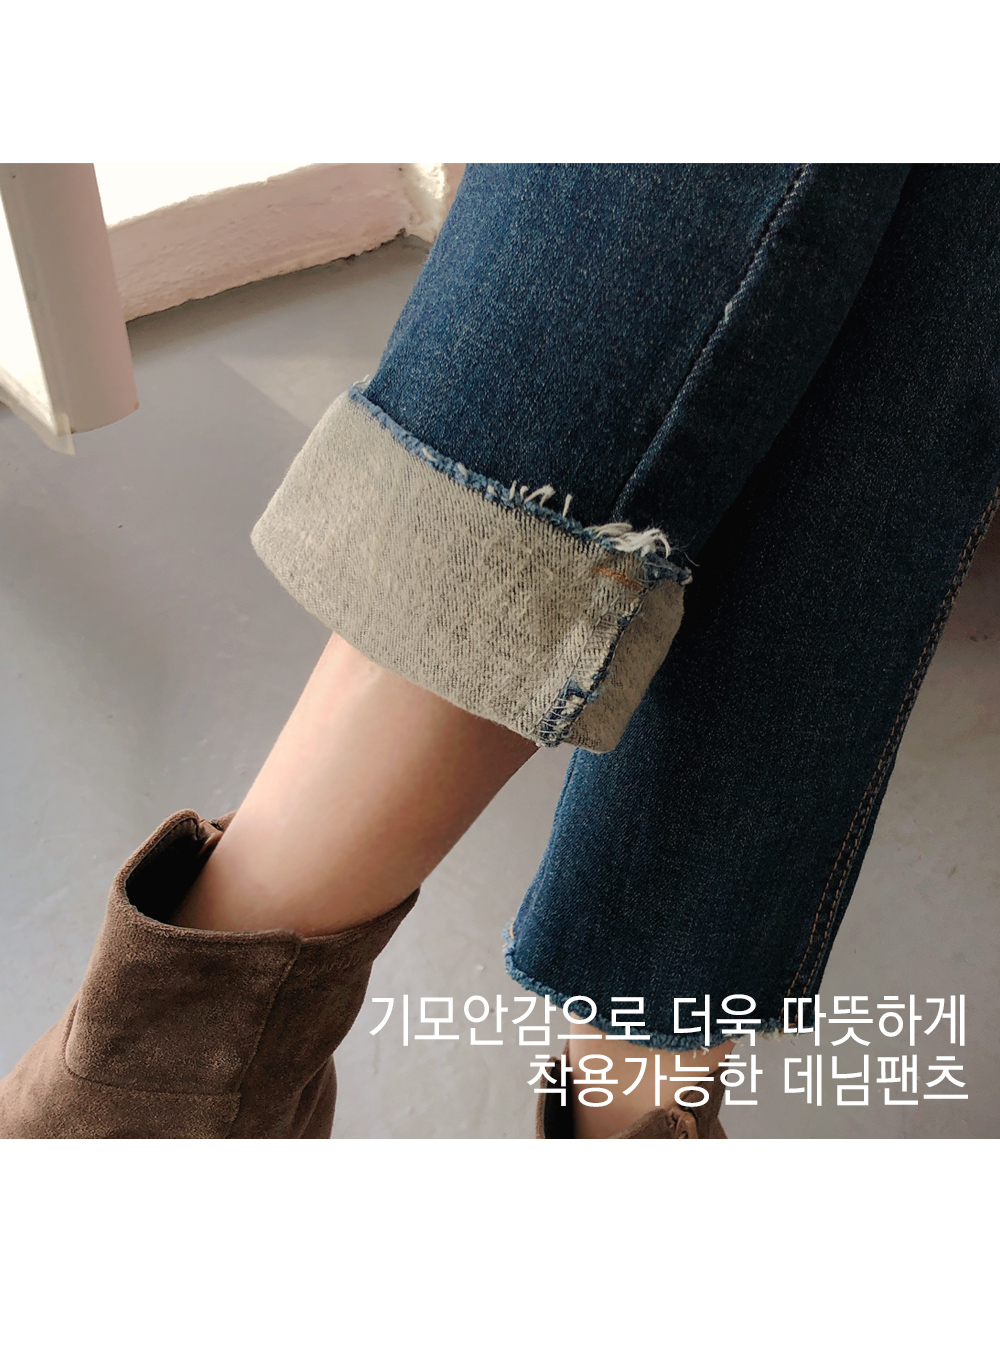 Warm brushed pants